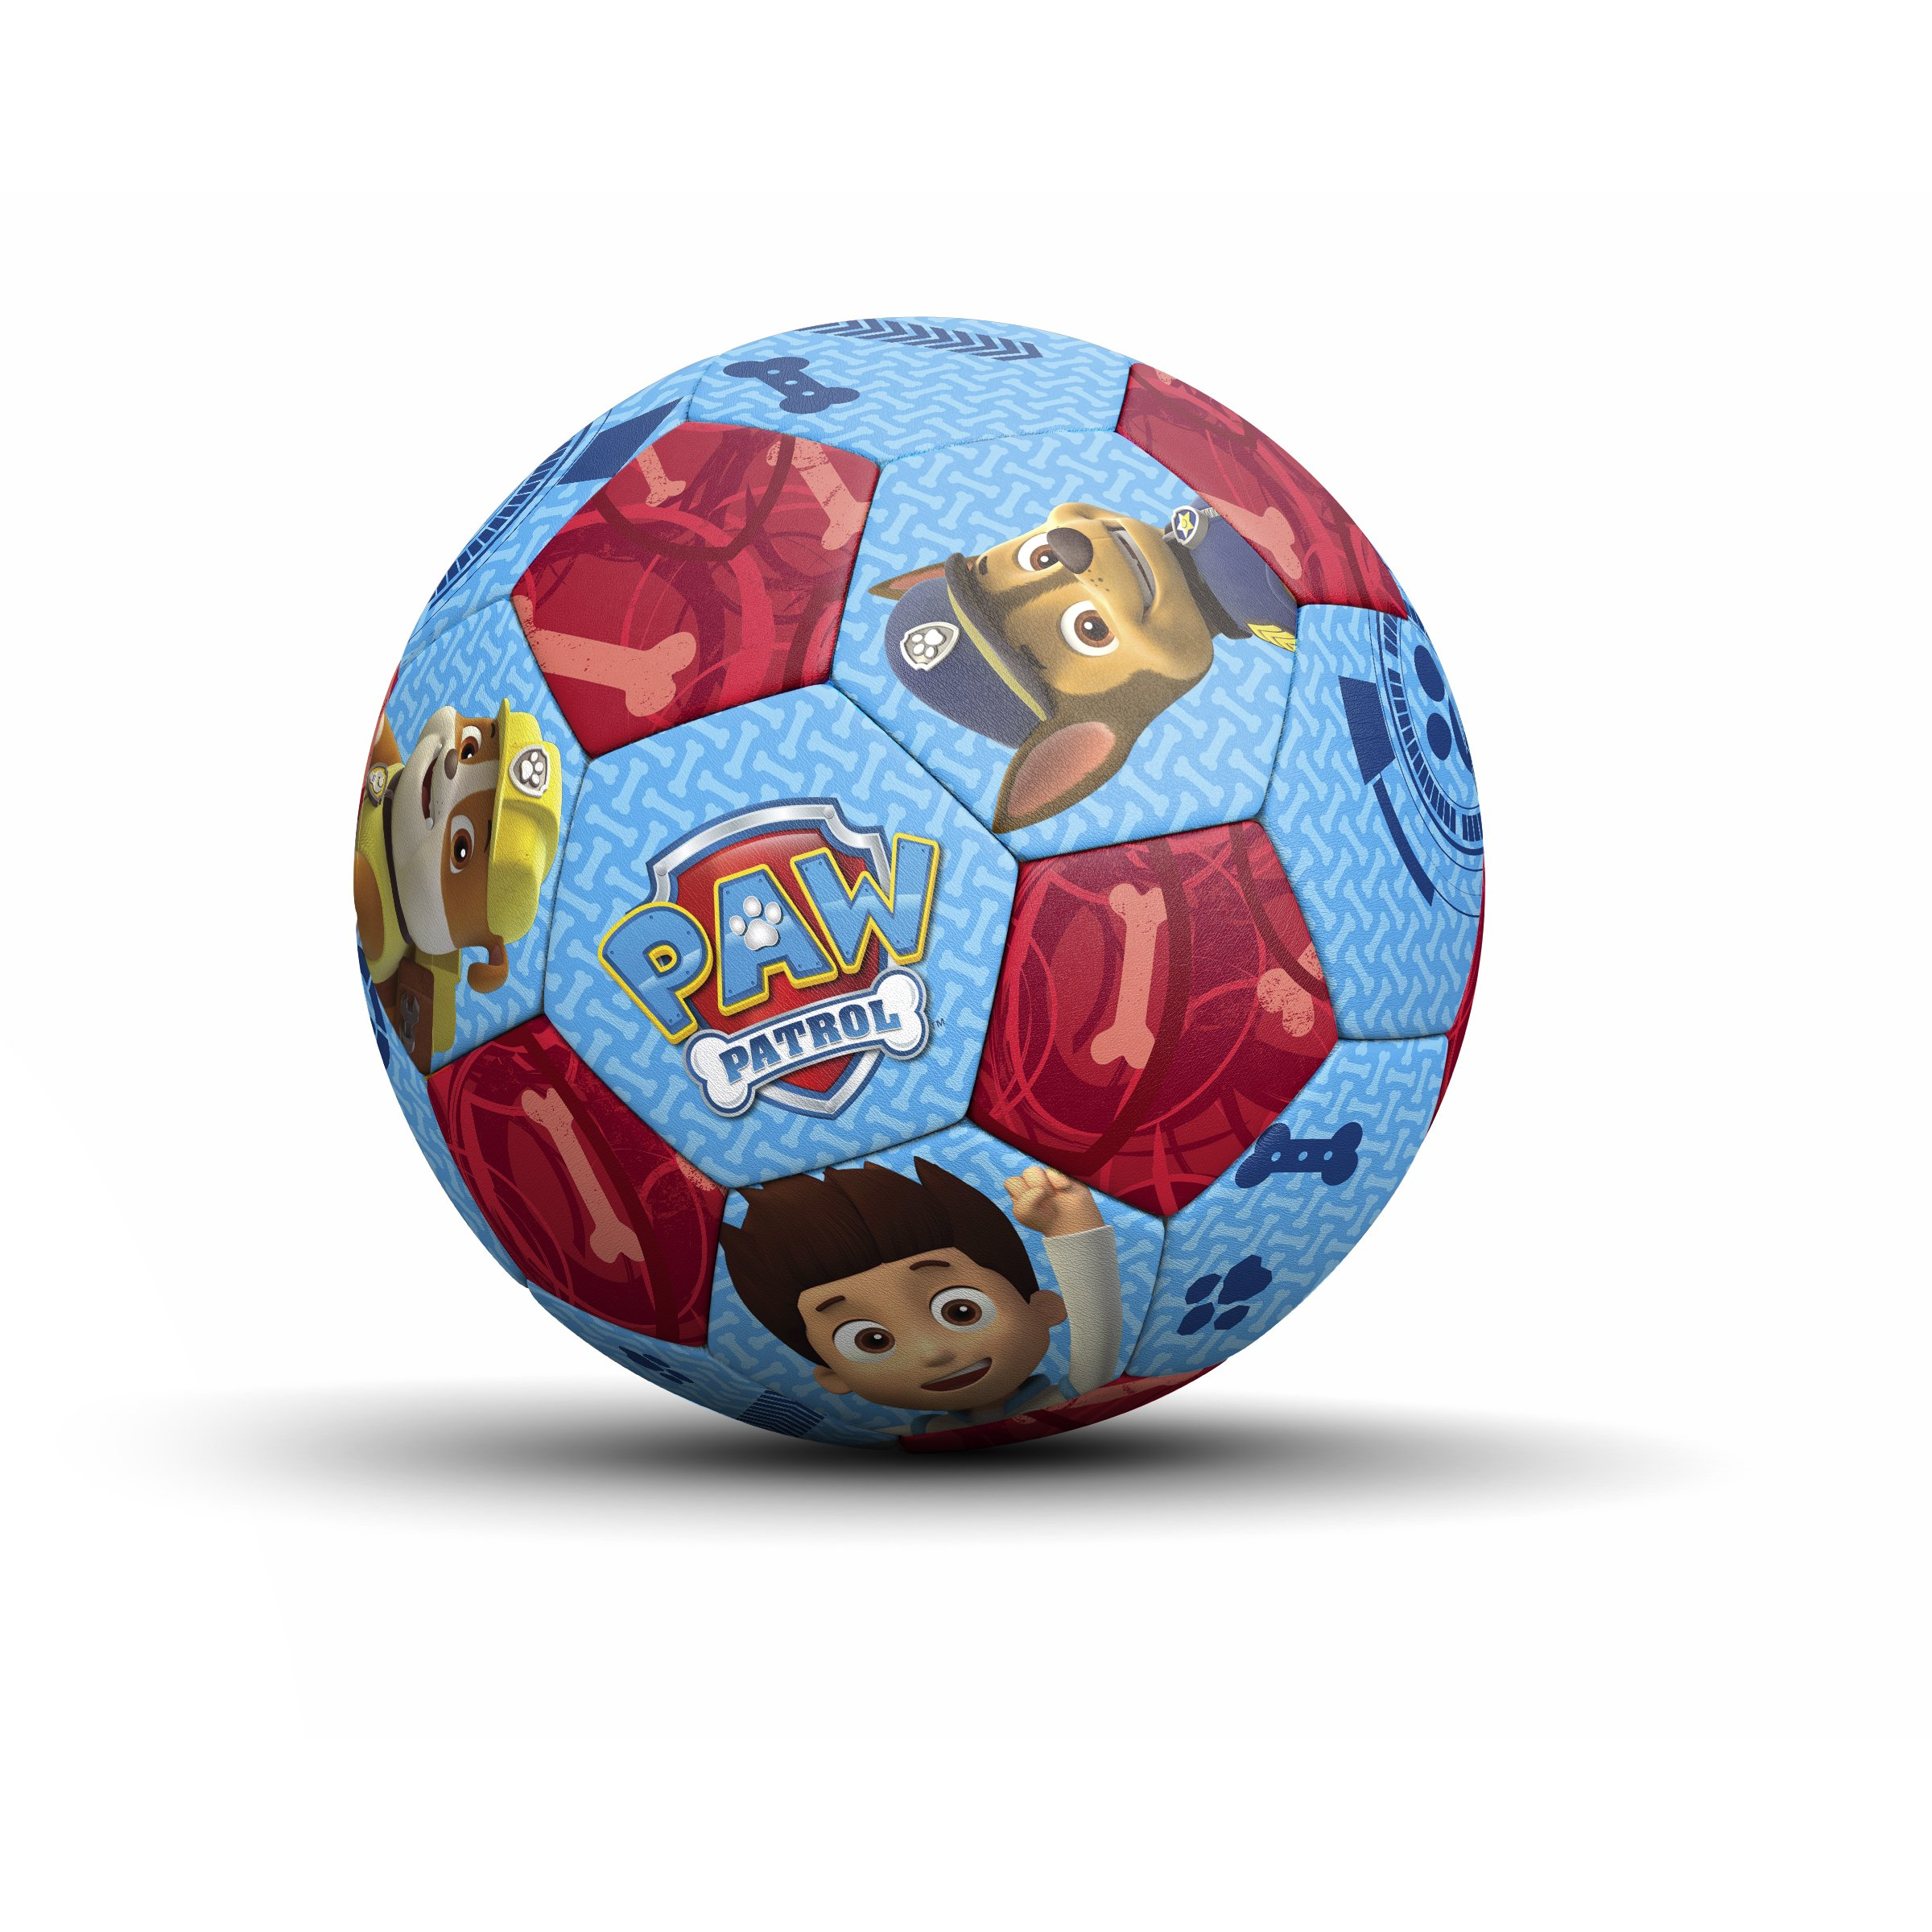 Nickelodeon Hedstrom Paw Patrol Jr. Soccer Ball, 7 Inch